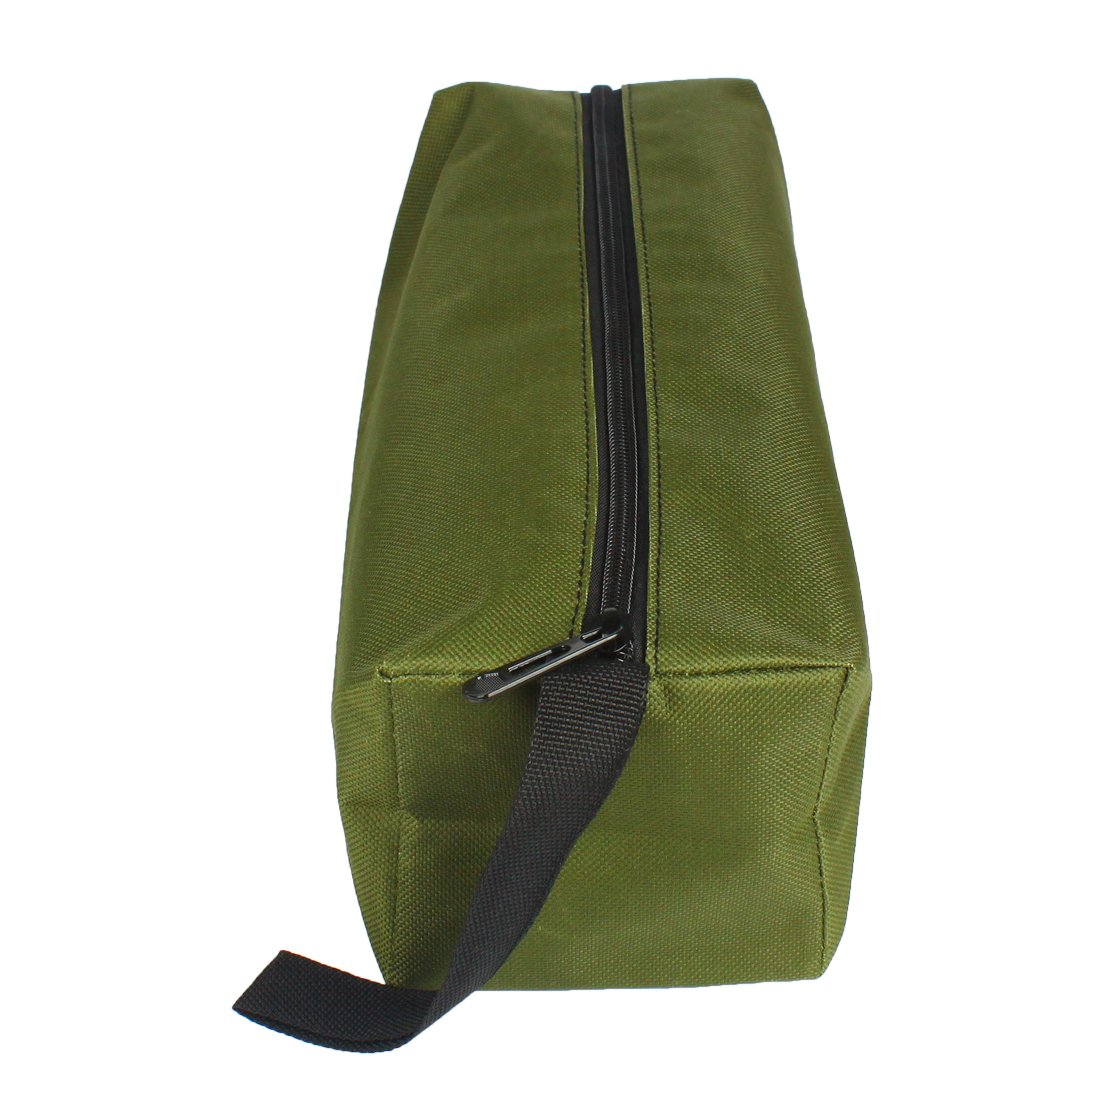 Andux Zone Kit de herramienta bolsa de almacenamiento bolsa de cremallera herramienta impermeable WJSNB-01 Negro